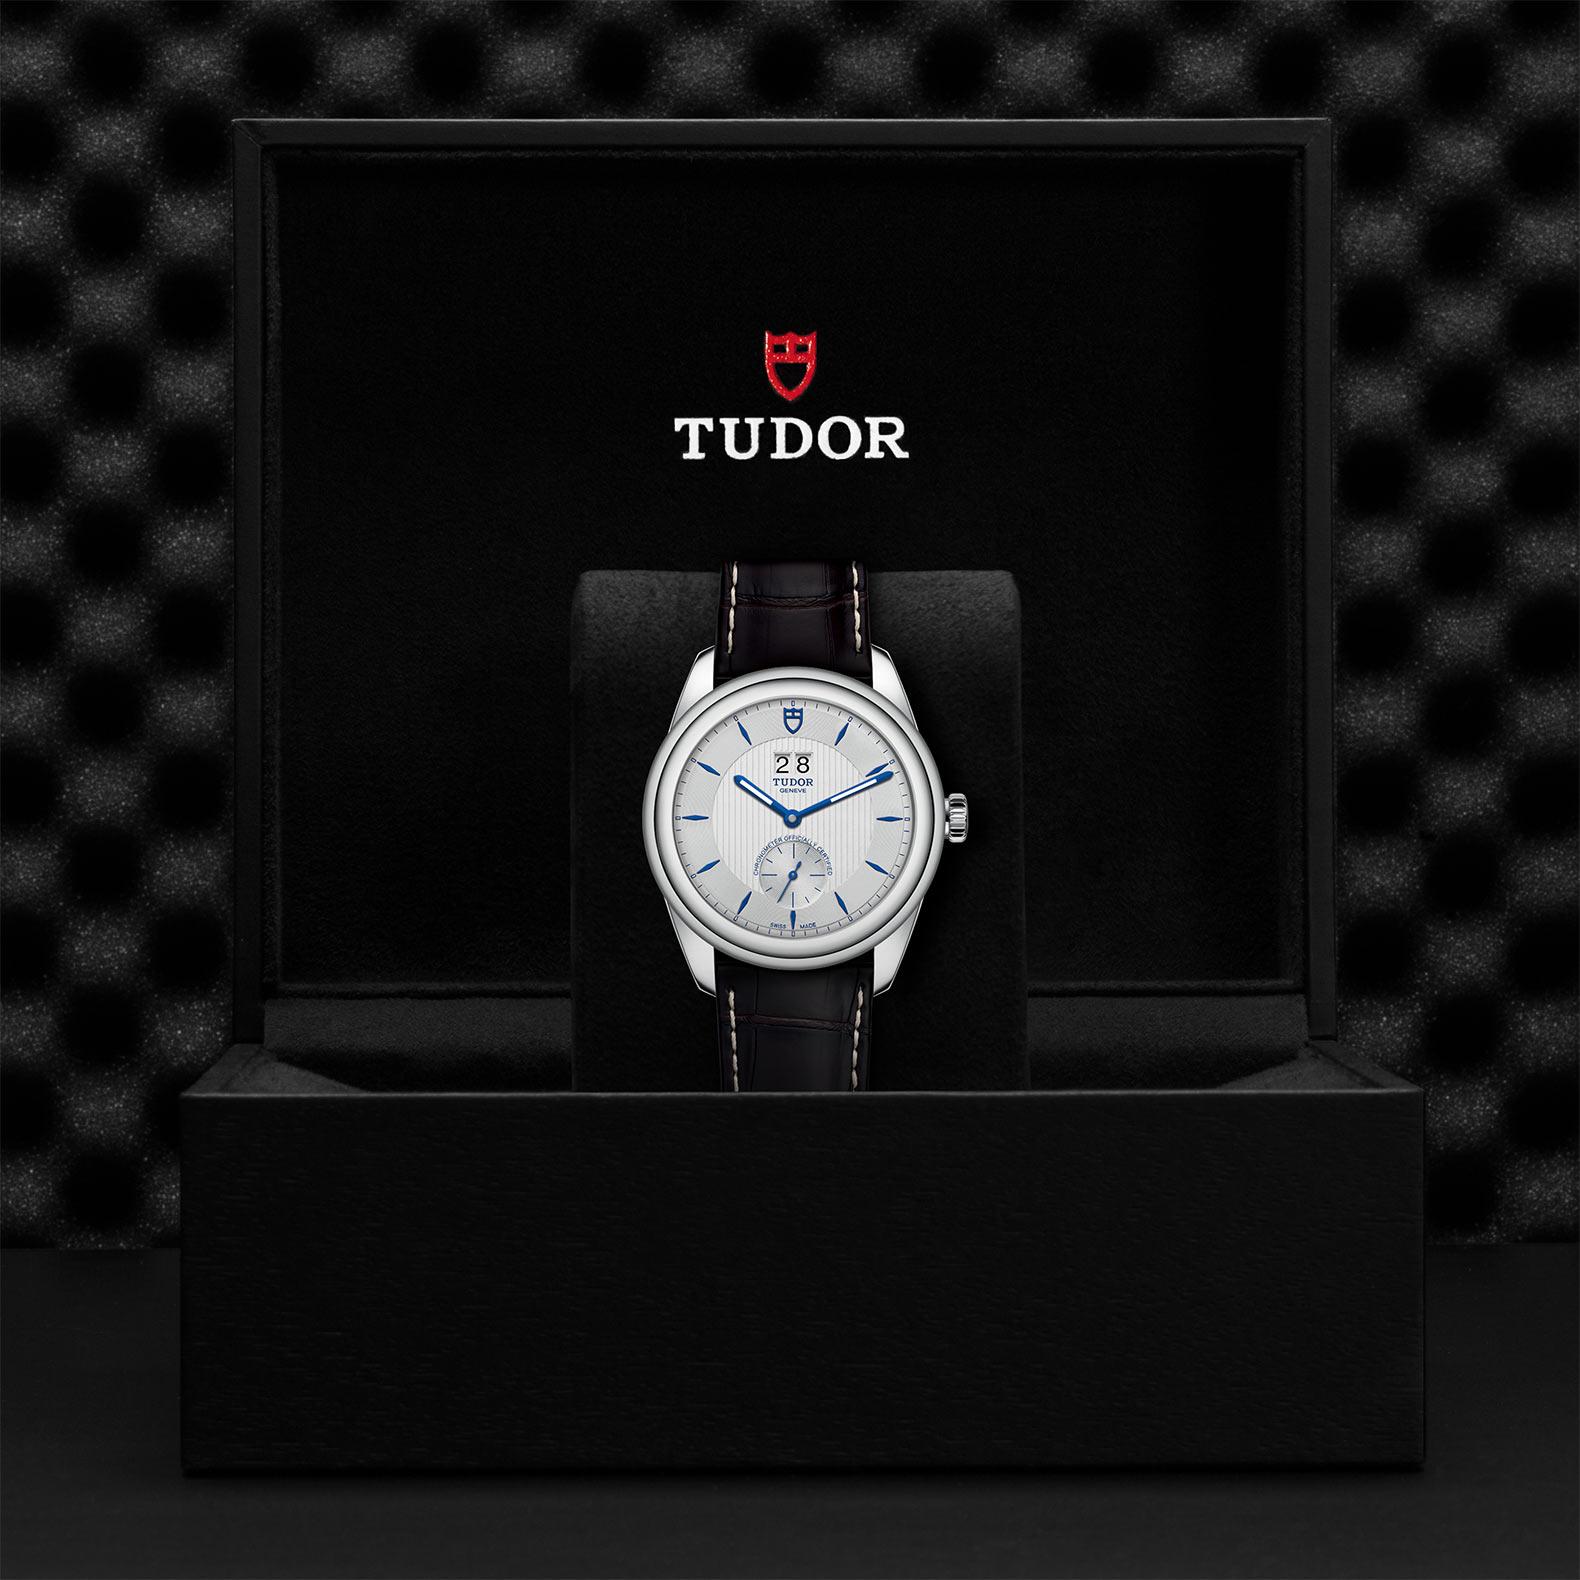 TUDOR Glamour Double Date M57100 0016 Presentationbox